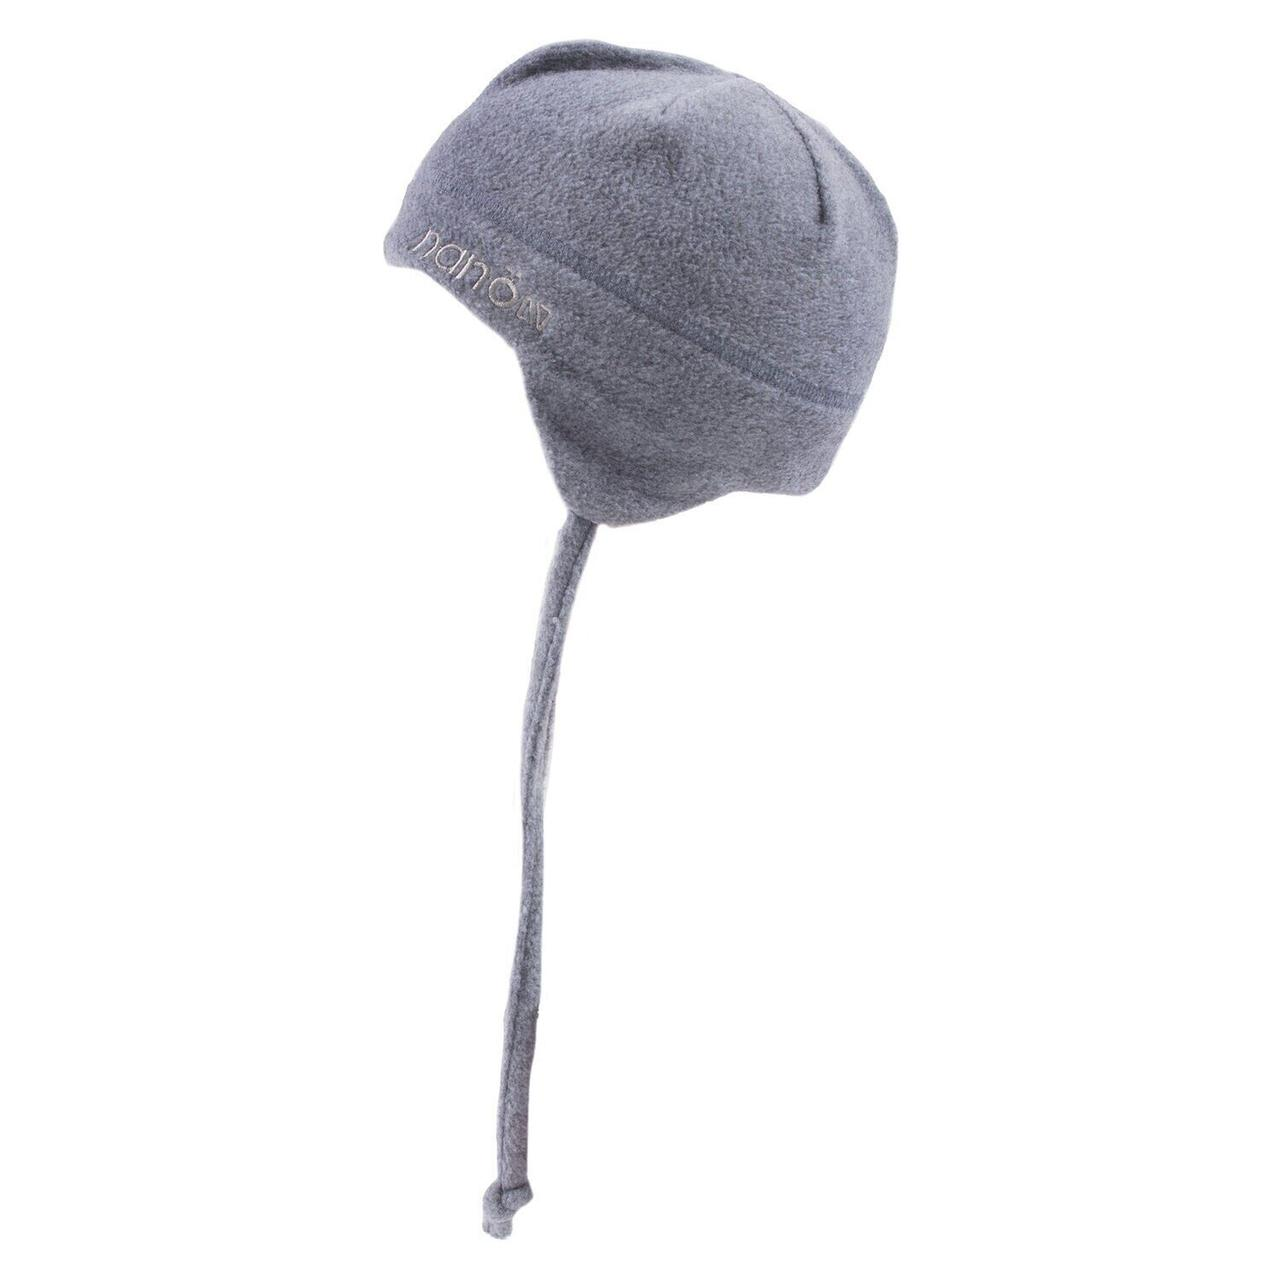 Шапка для мальчика Nano BTUP501-F19_MidGrayMix размер 46-48